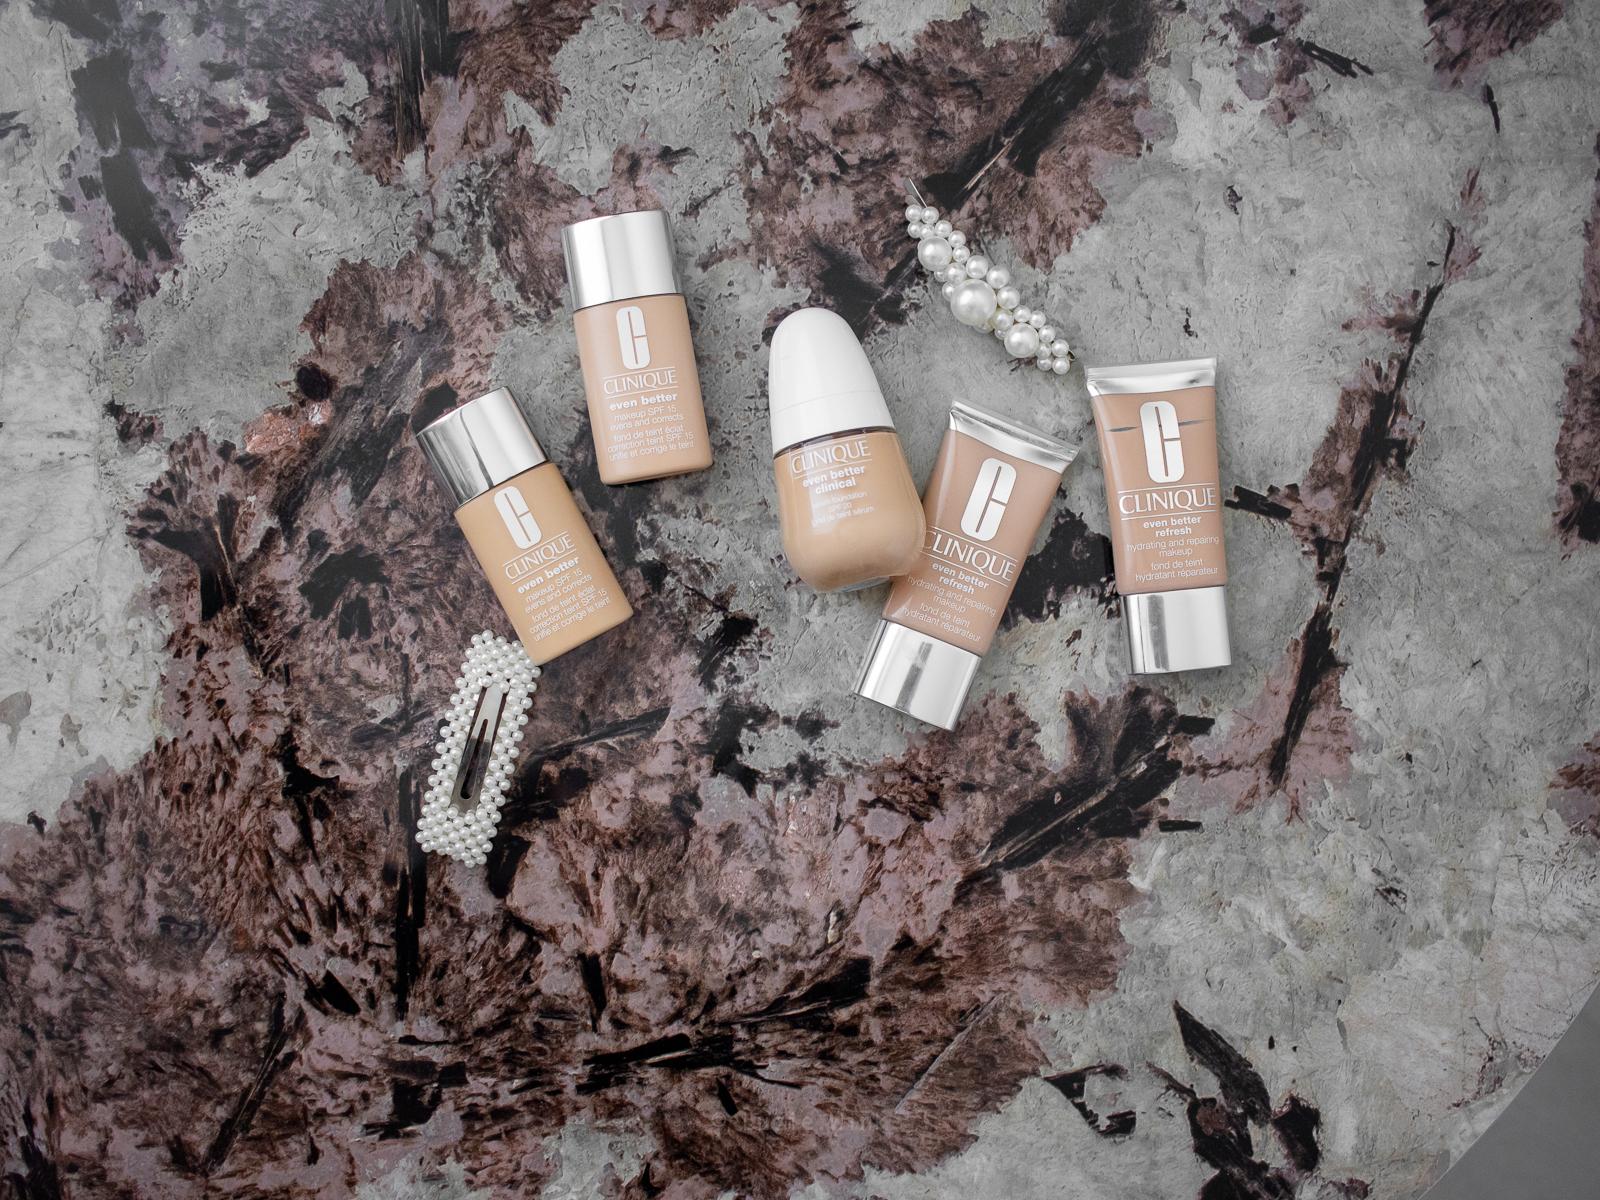 Clinique makeup odstíny Evropě n Better Clinical refresh